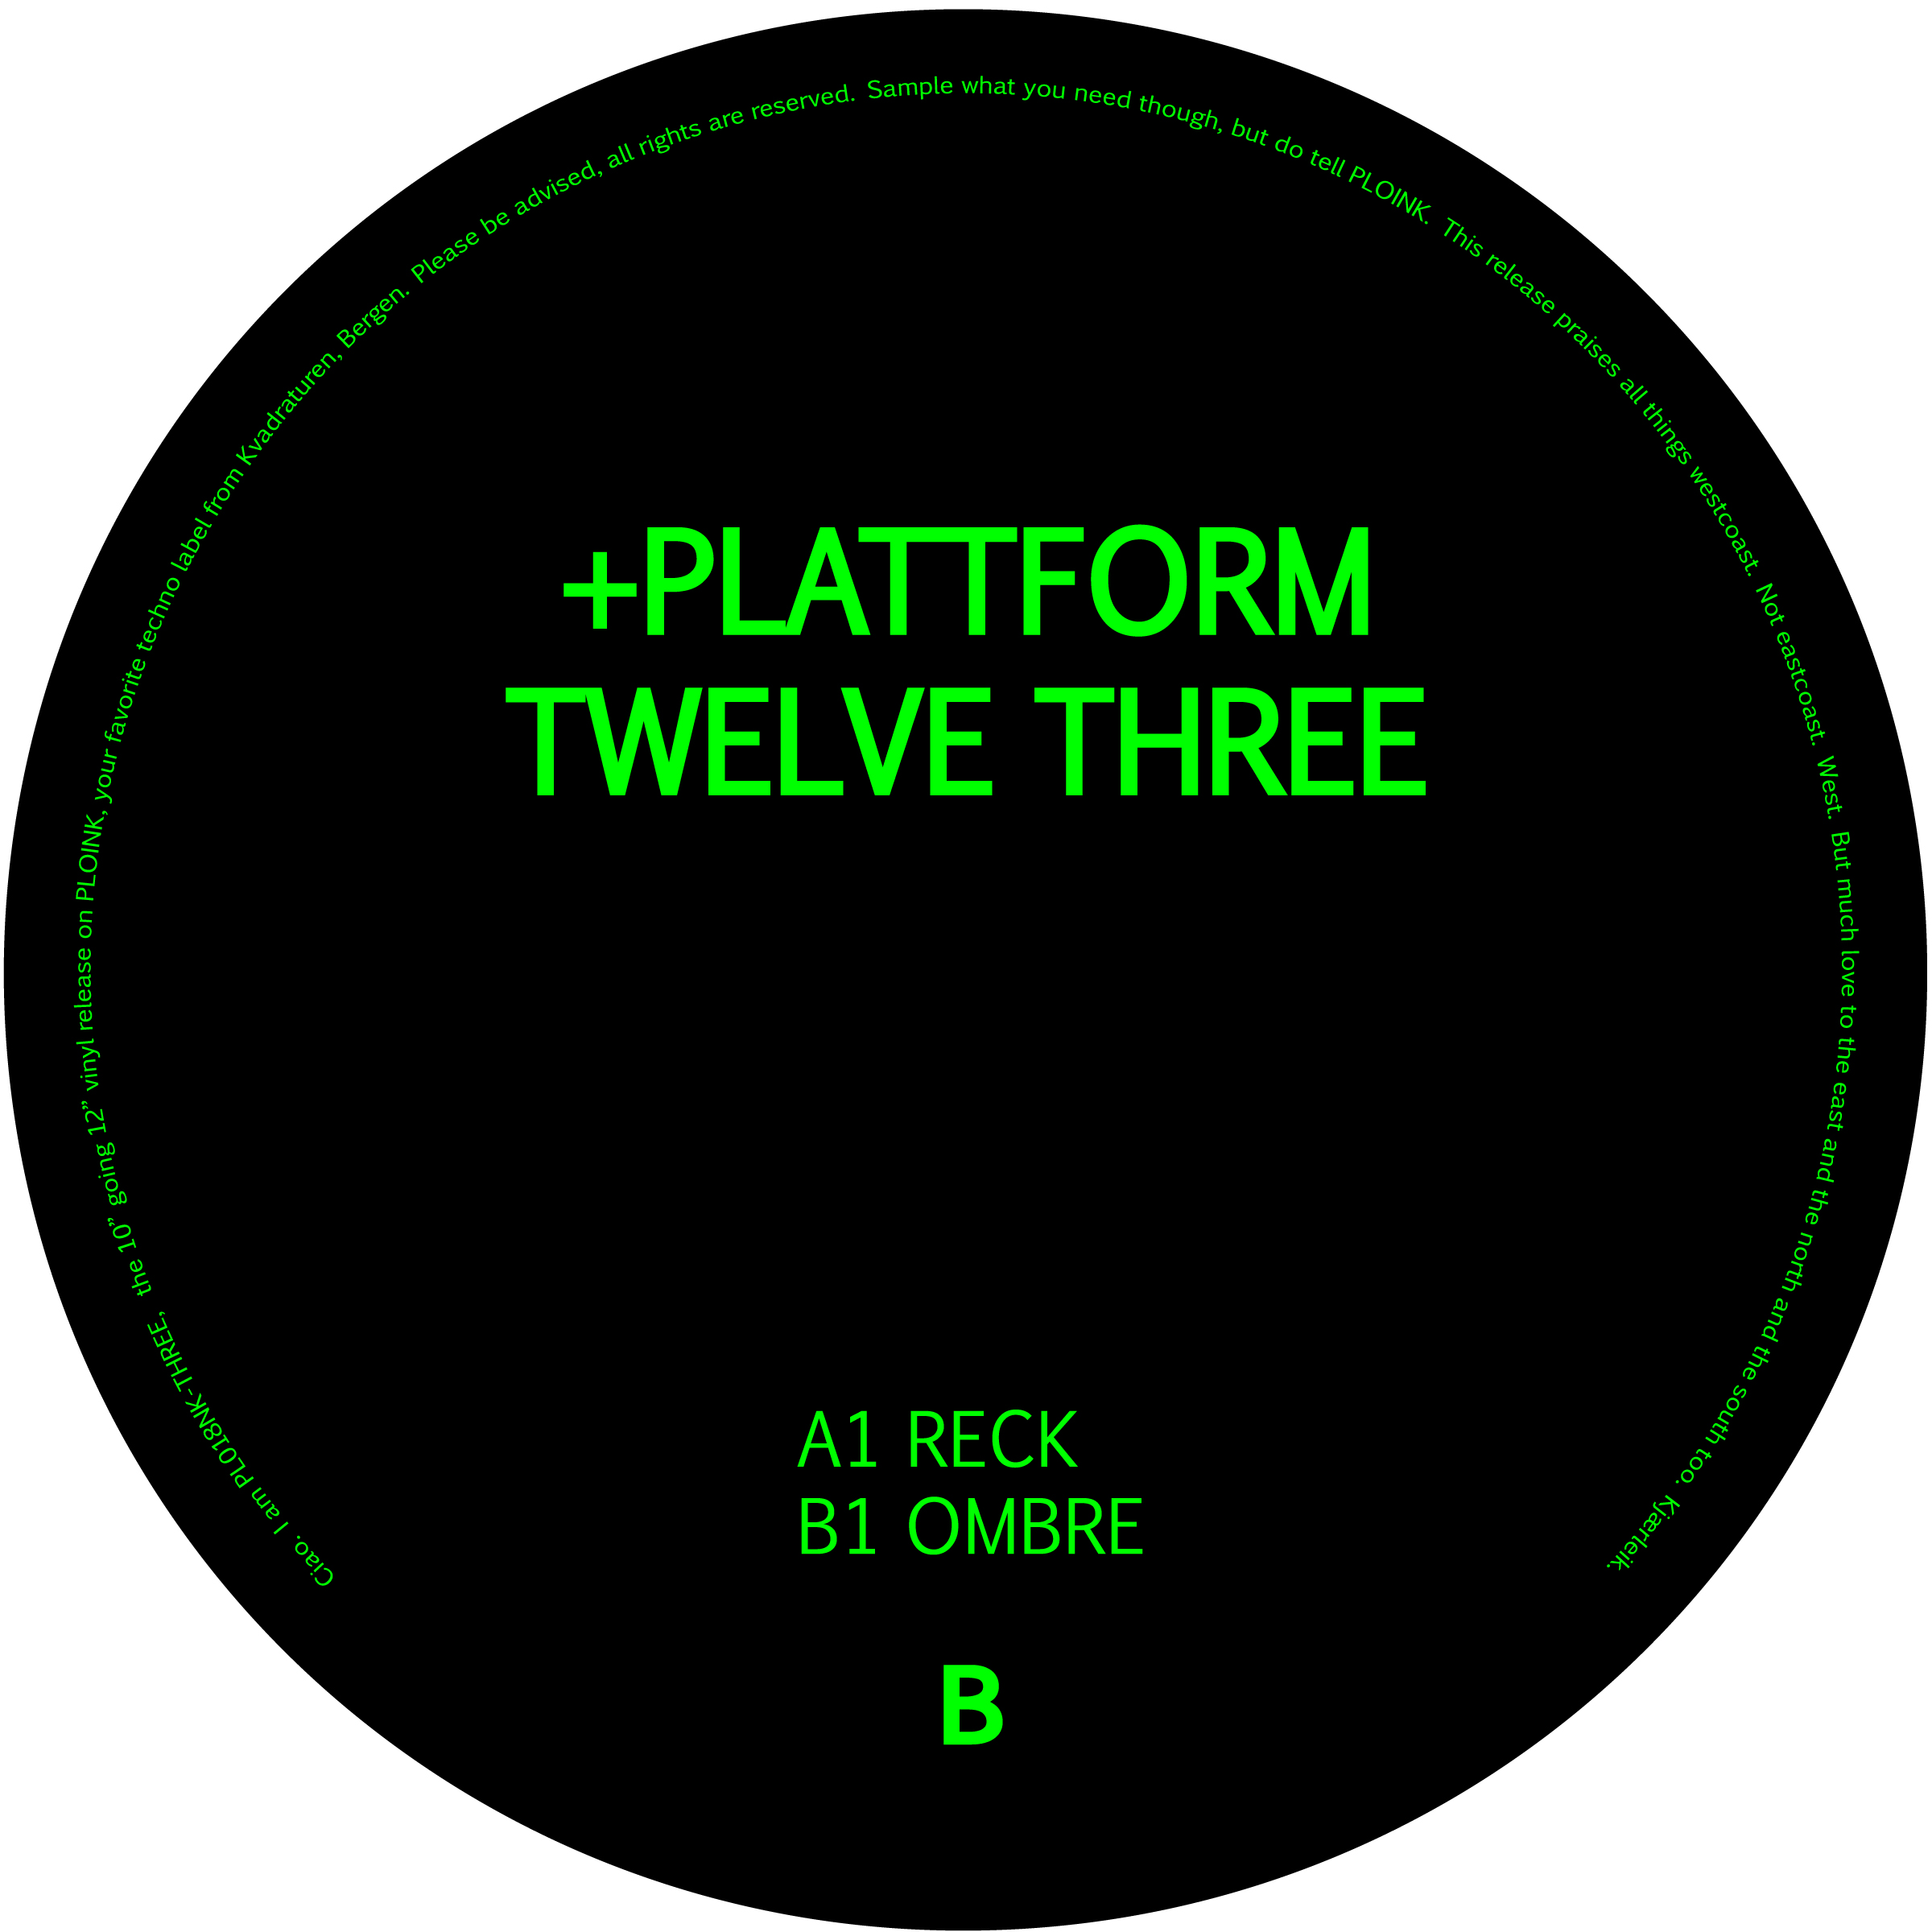 PL018NK-THREE+PLATTFORMTWELVE (ALBUM)Release date: 2JUN17